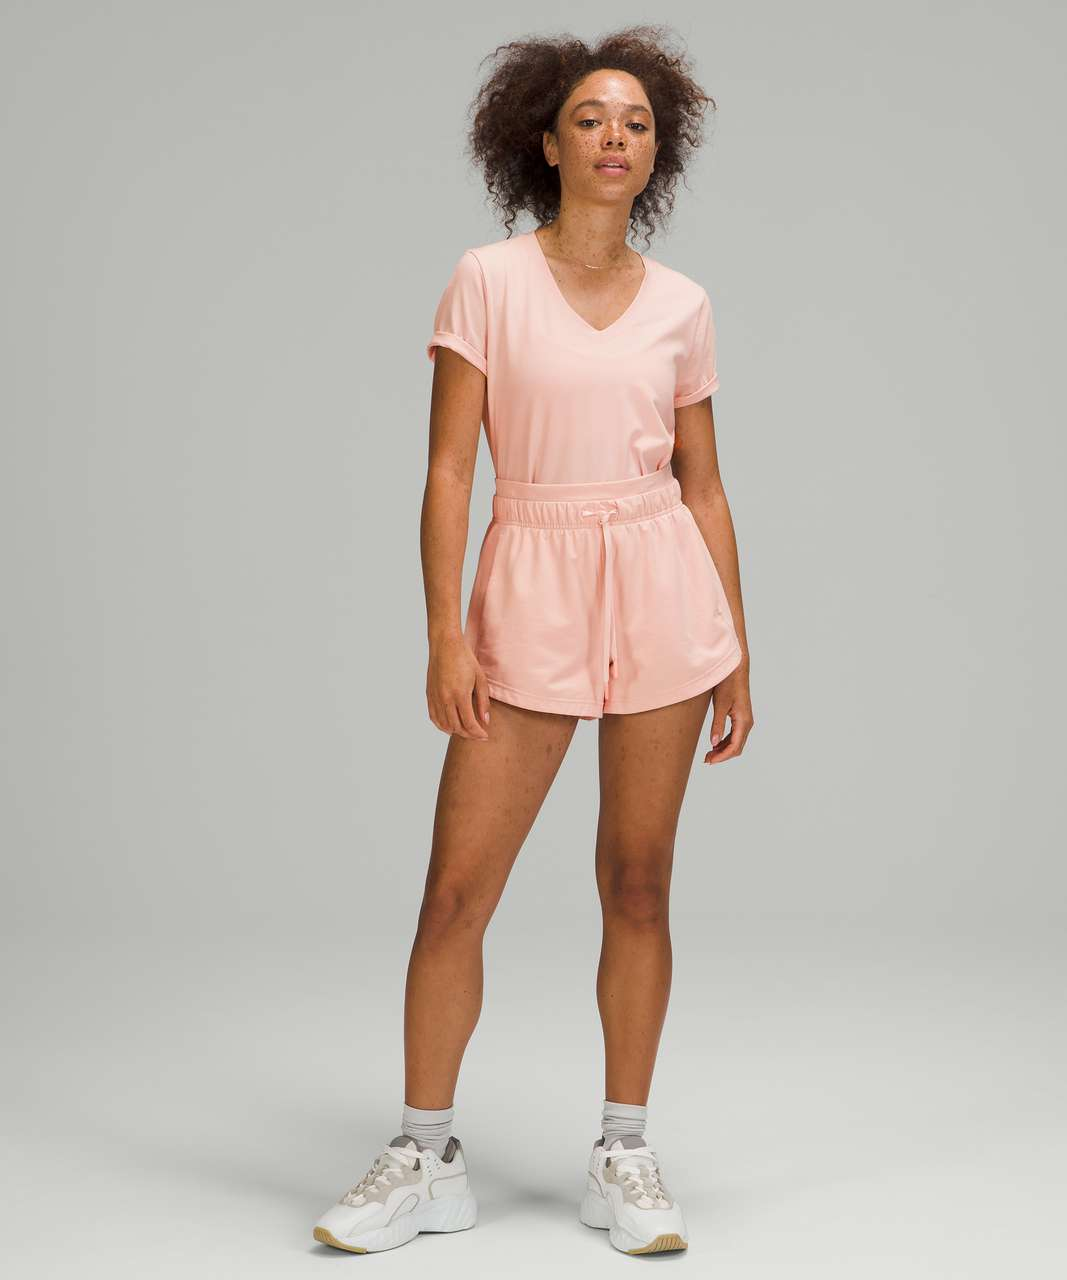 Lululemon Love Tee Short Sleeve V-Neck T-Shirt - Pink Mist